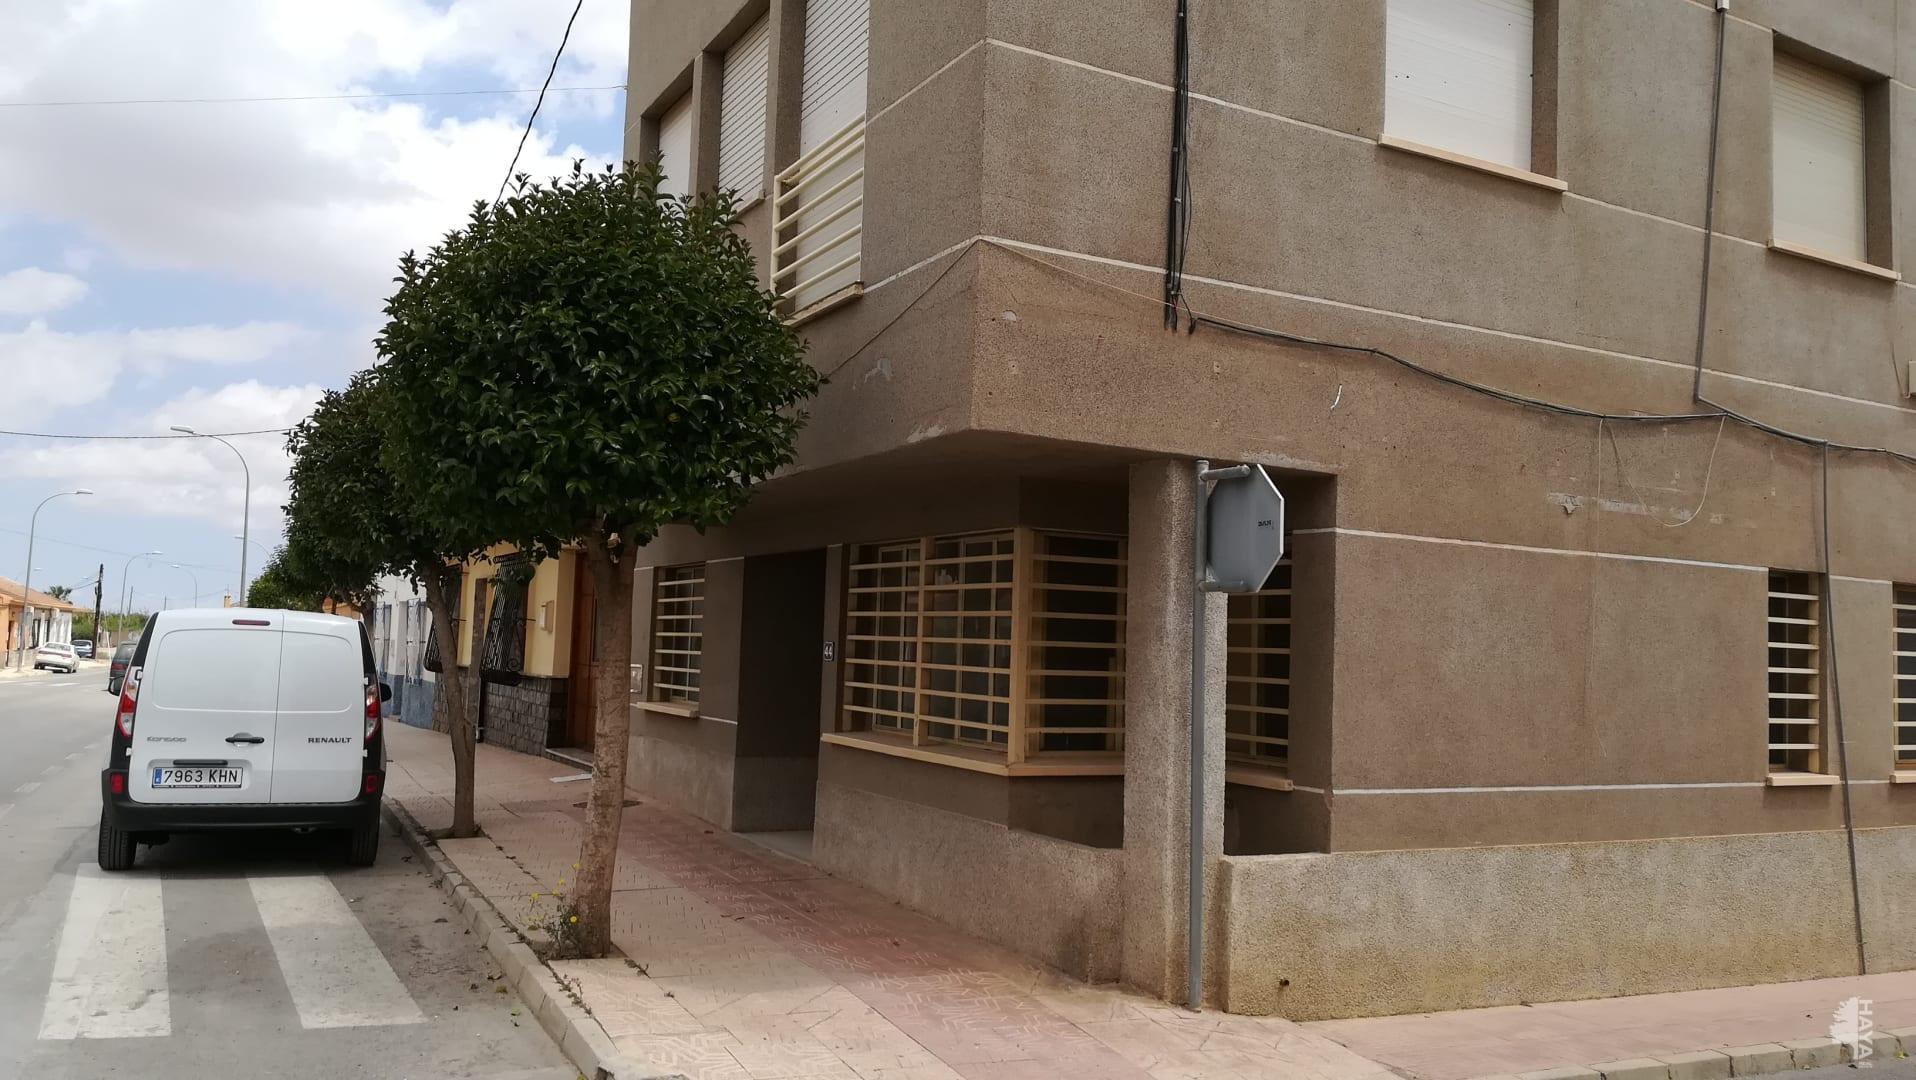 Local en venta en Fuente Álamo de Murcia, Murcia, Calle Lorca, 49.300 €, 83 m2